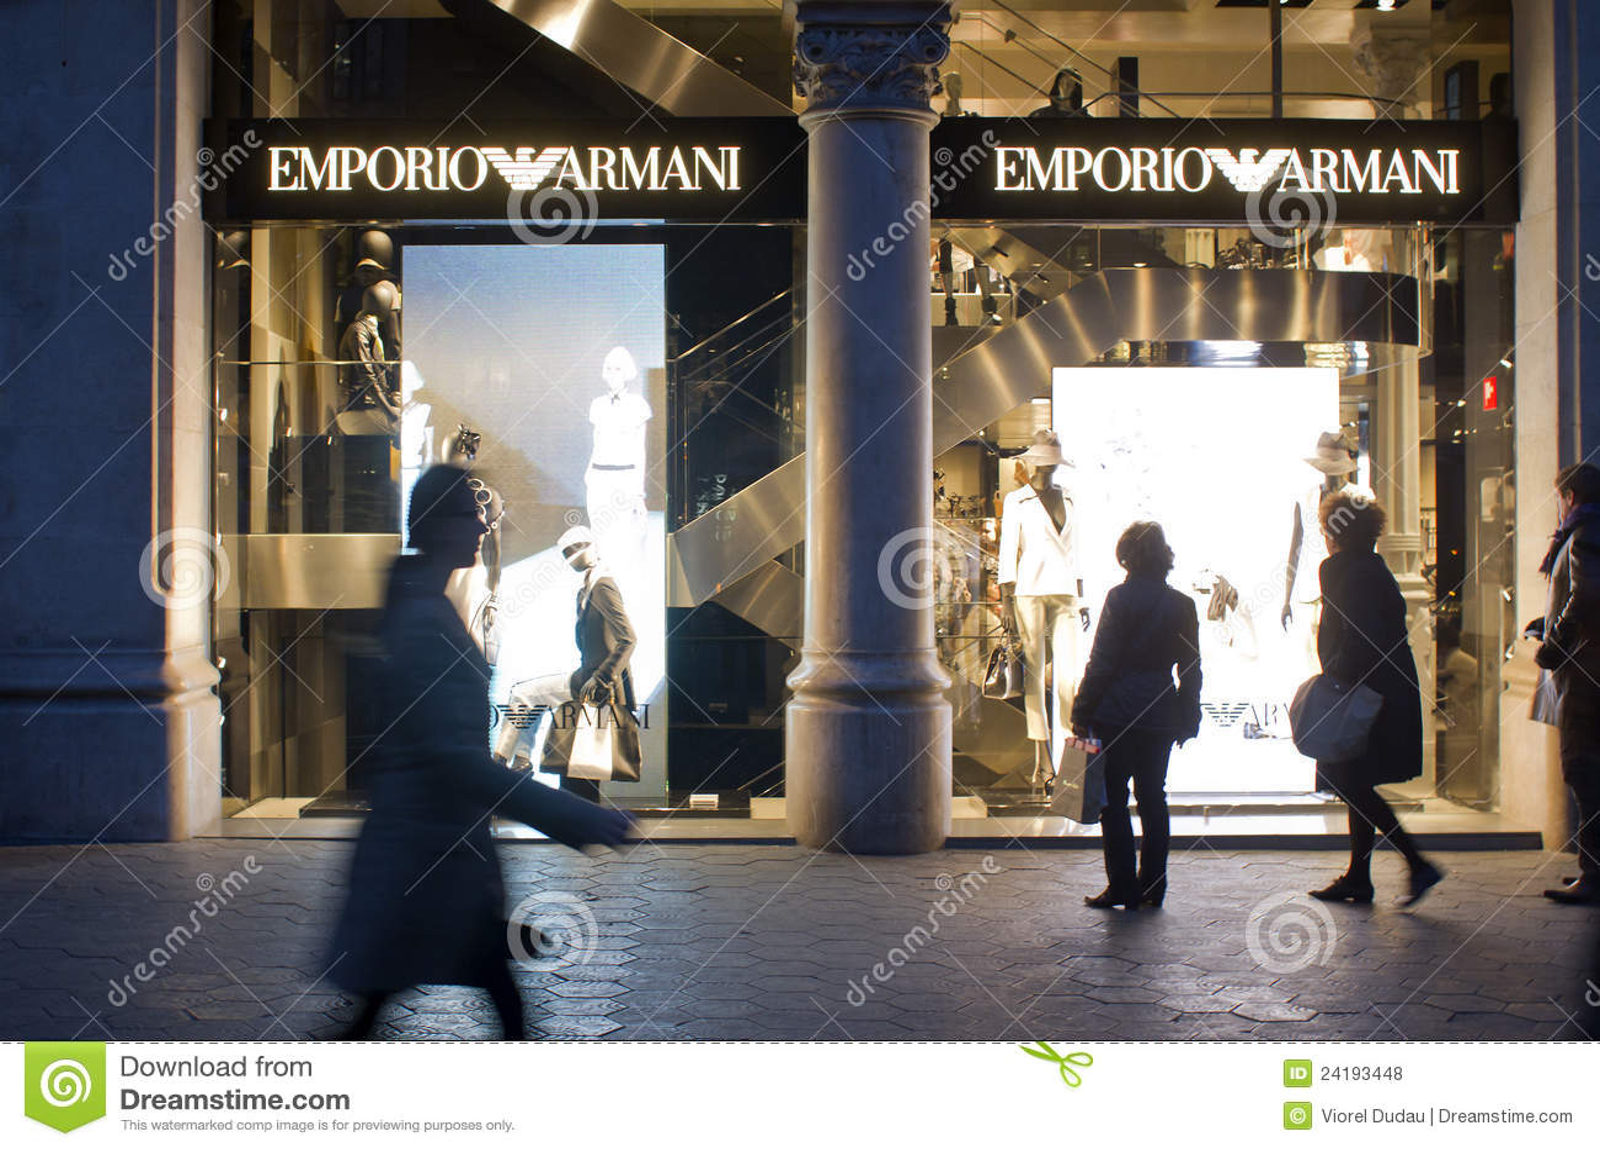 78ba07054b65f Loja de Emporio Armani foto de stock editorial. Imagem de barcelona ...